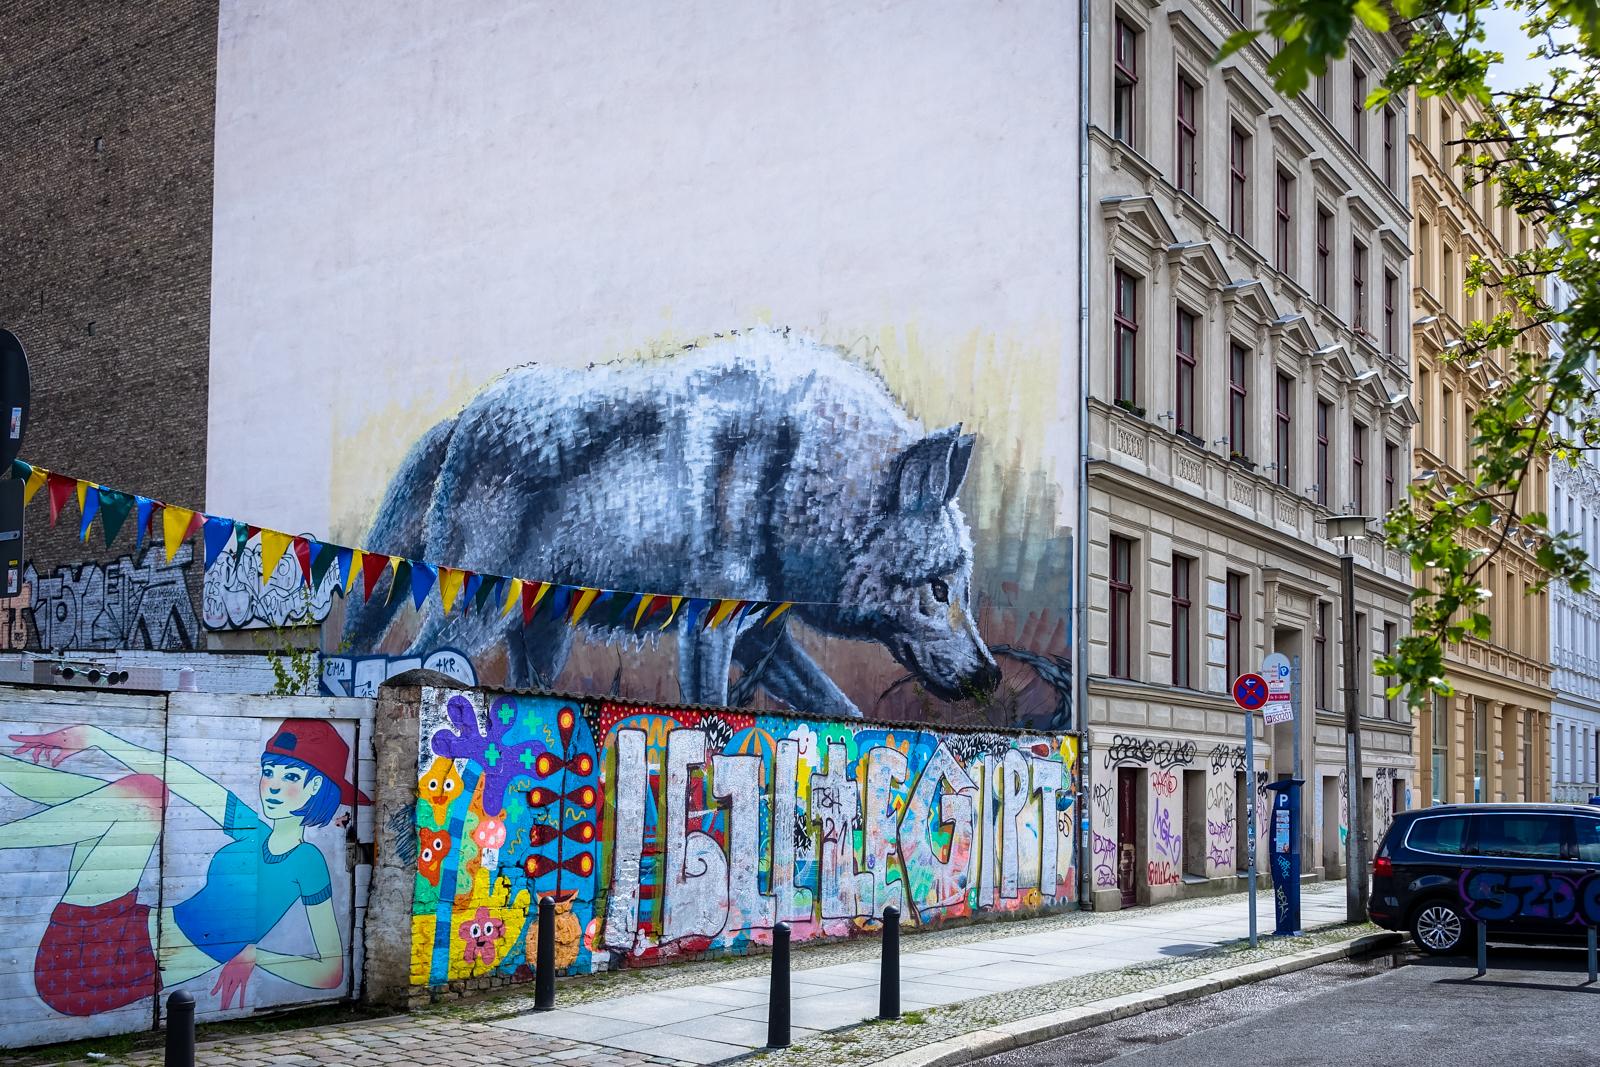 mural - alaniz & knock - fit tankstelle, berlin